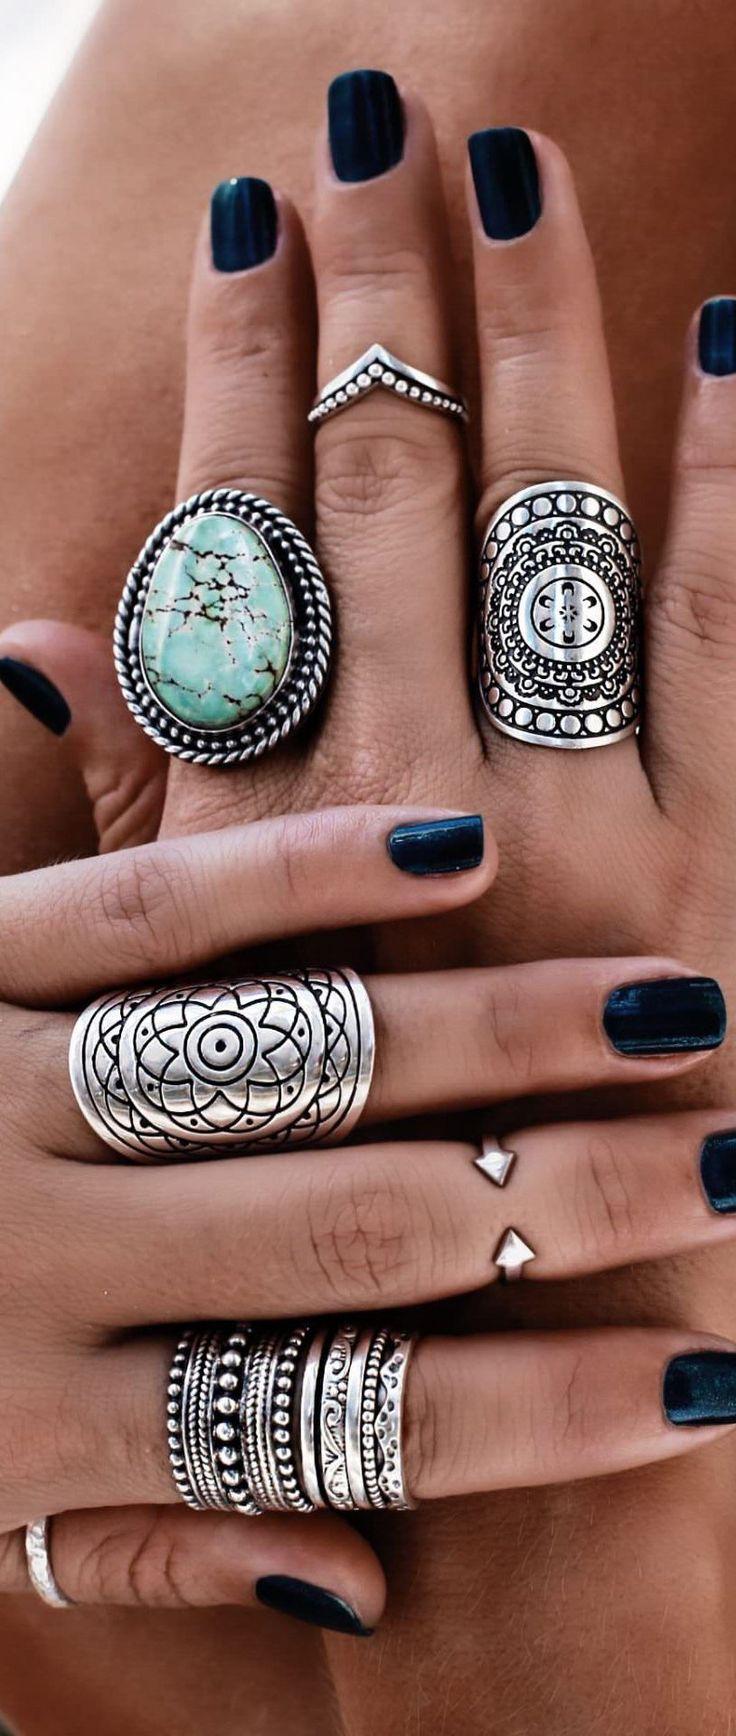 Bohemian style rings